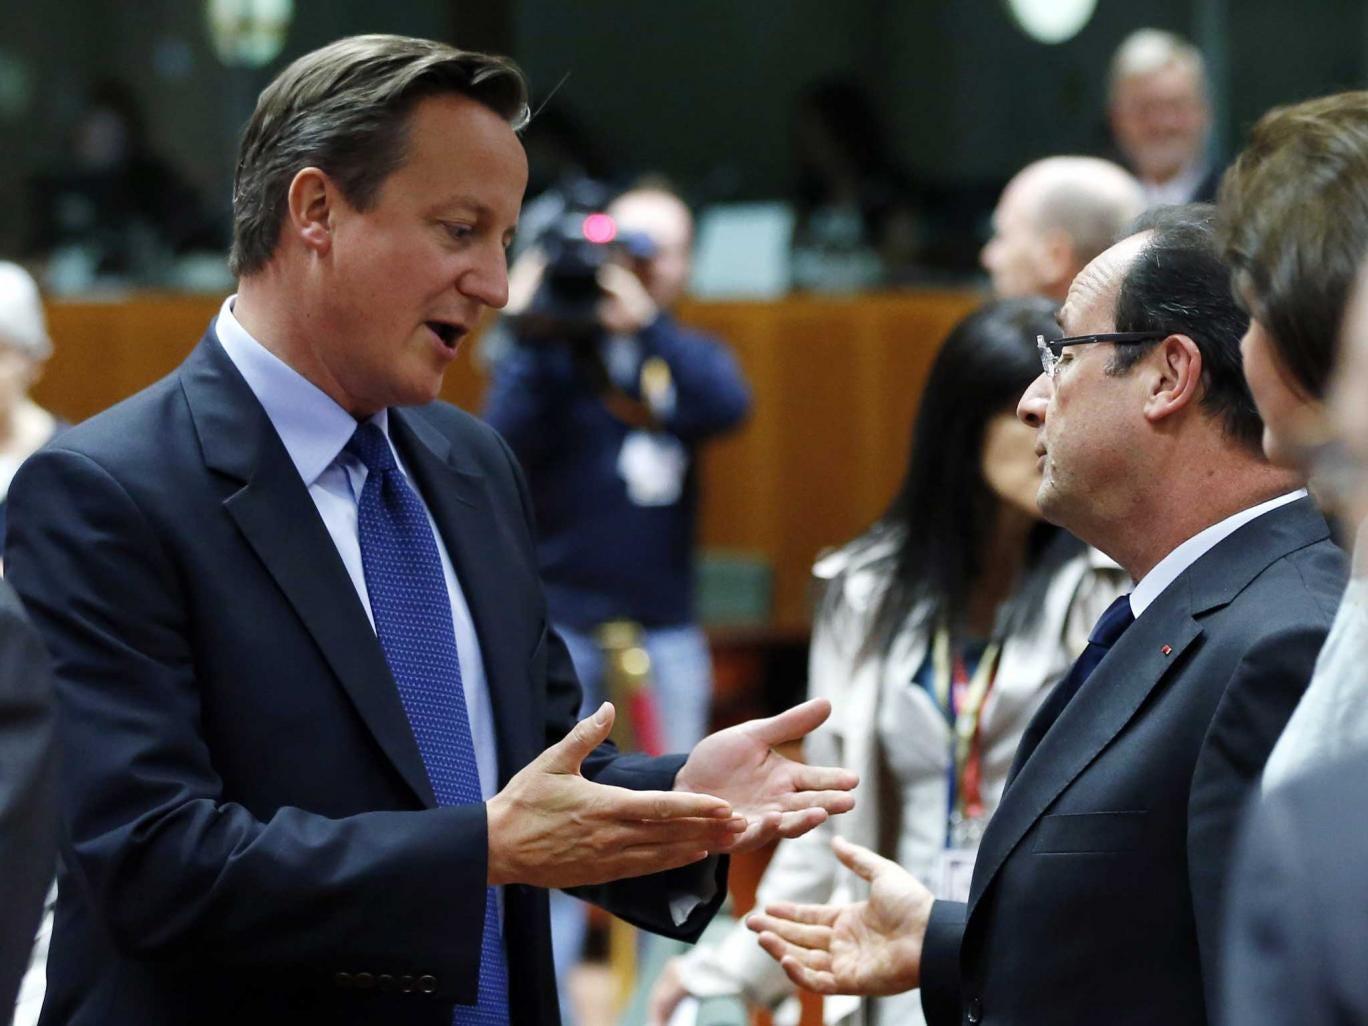 David Cameron talks to France's President Francois Hollande at the summit